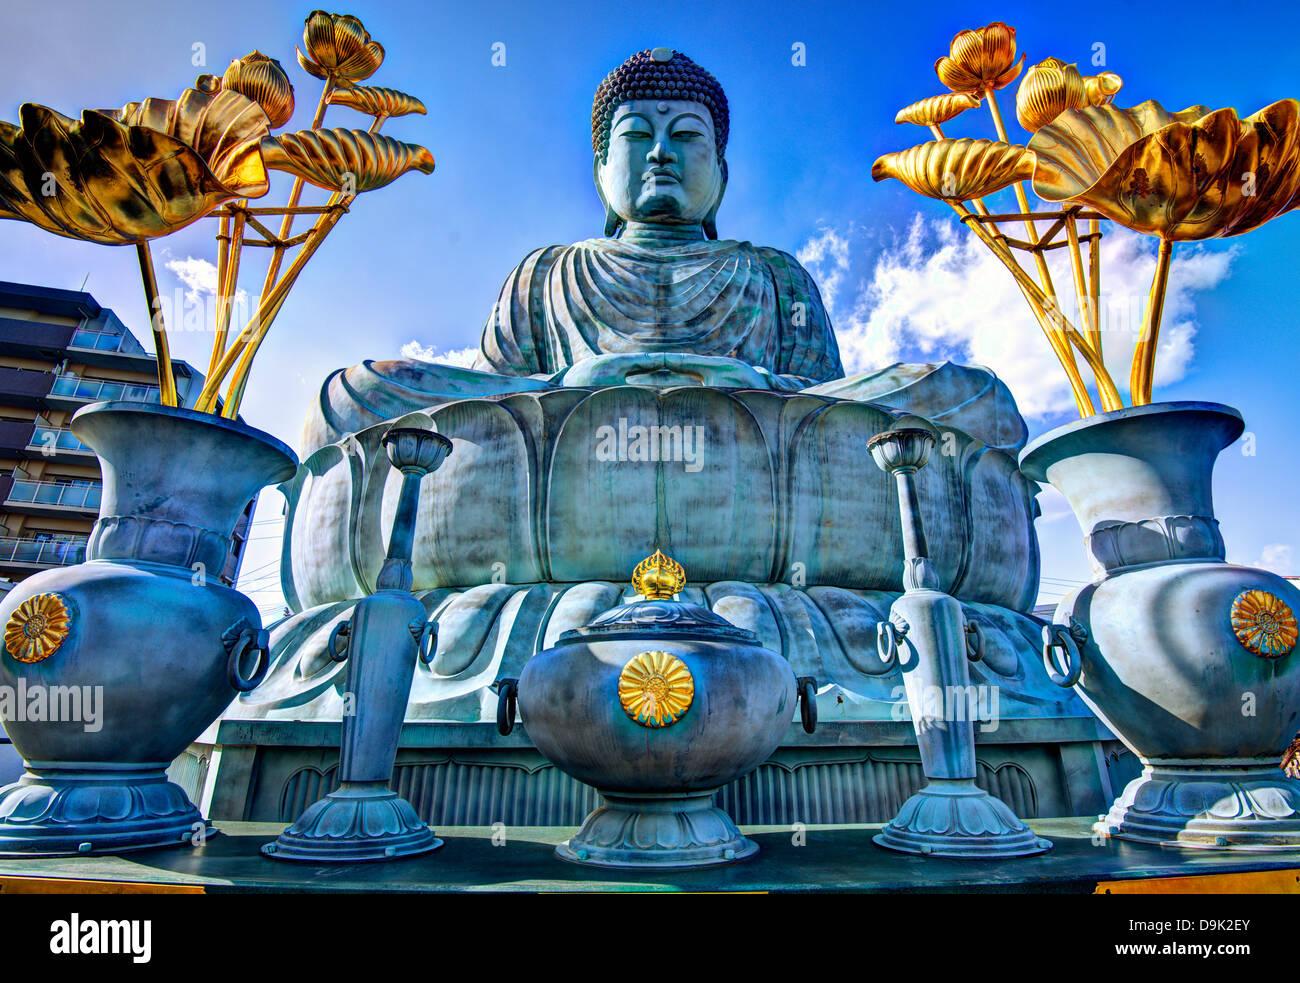 BIg Buddha of Hyogo in Kobe, Japan. - Stock Image